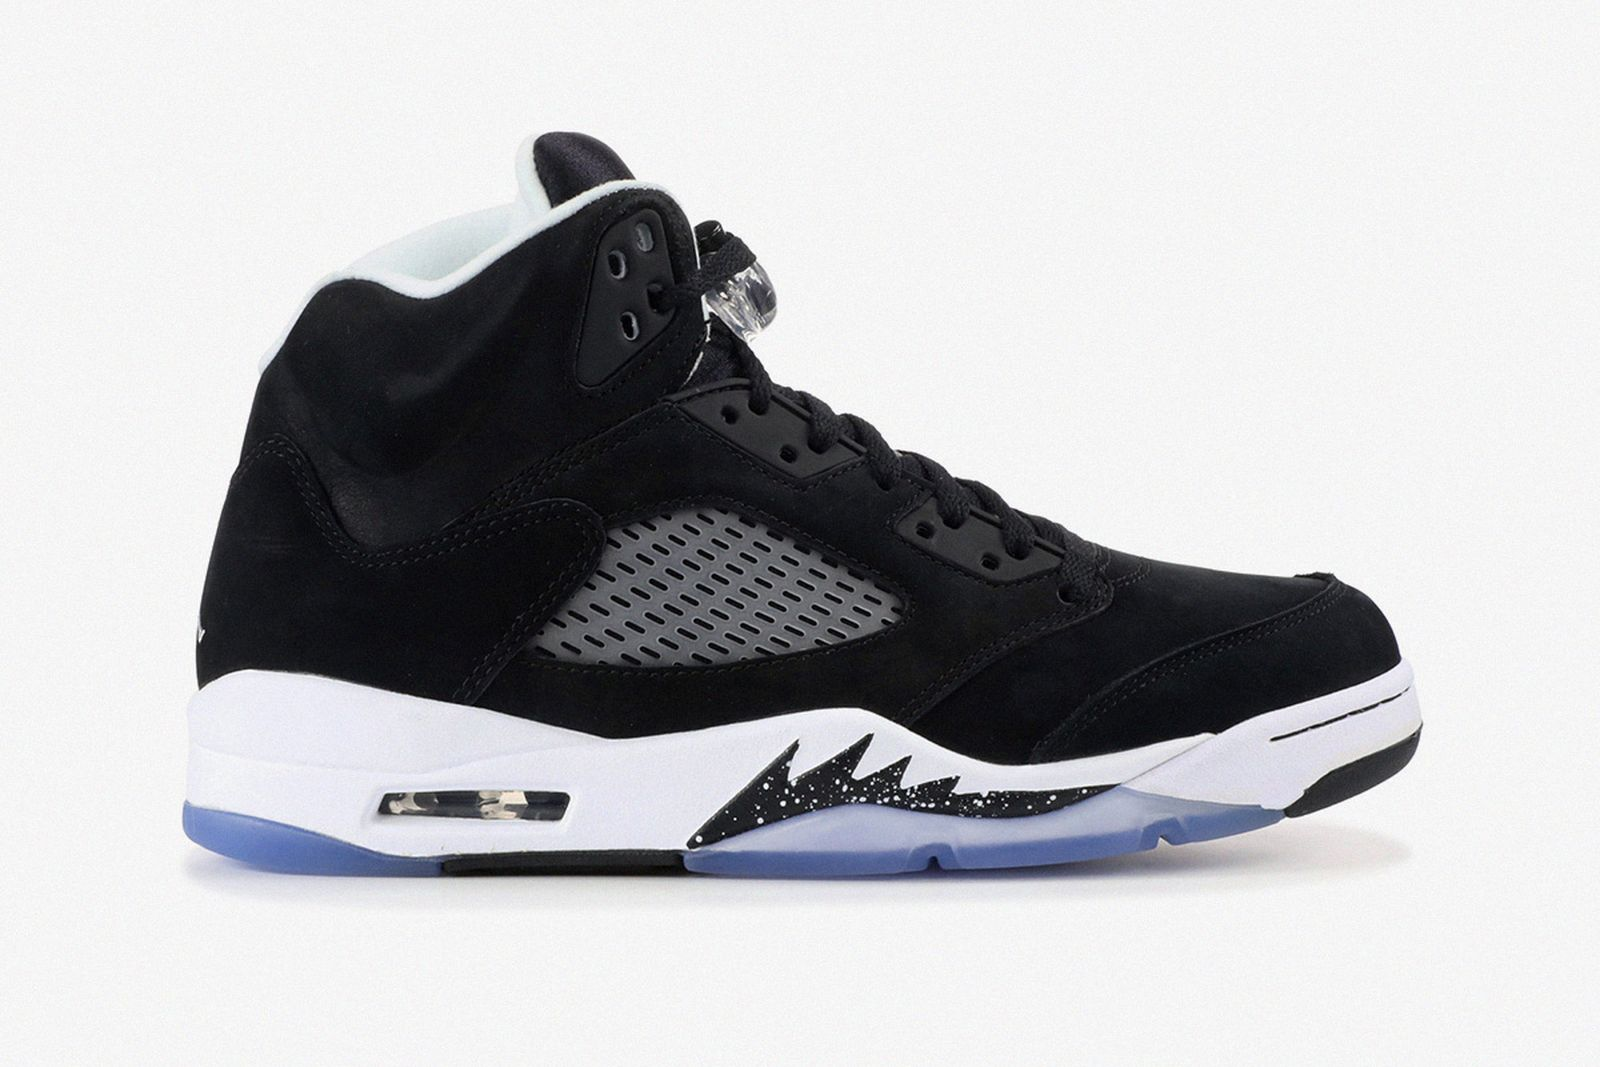 sneaker resell market Nike campless jordan brand